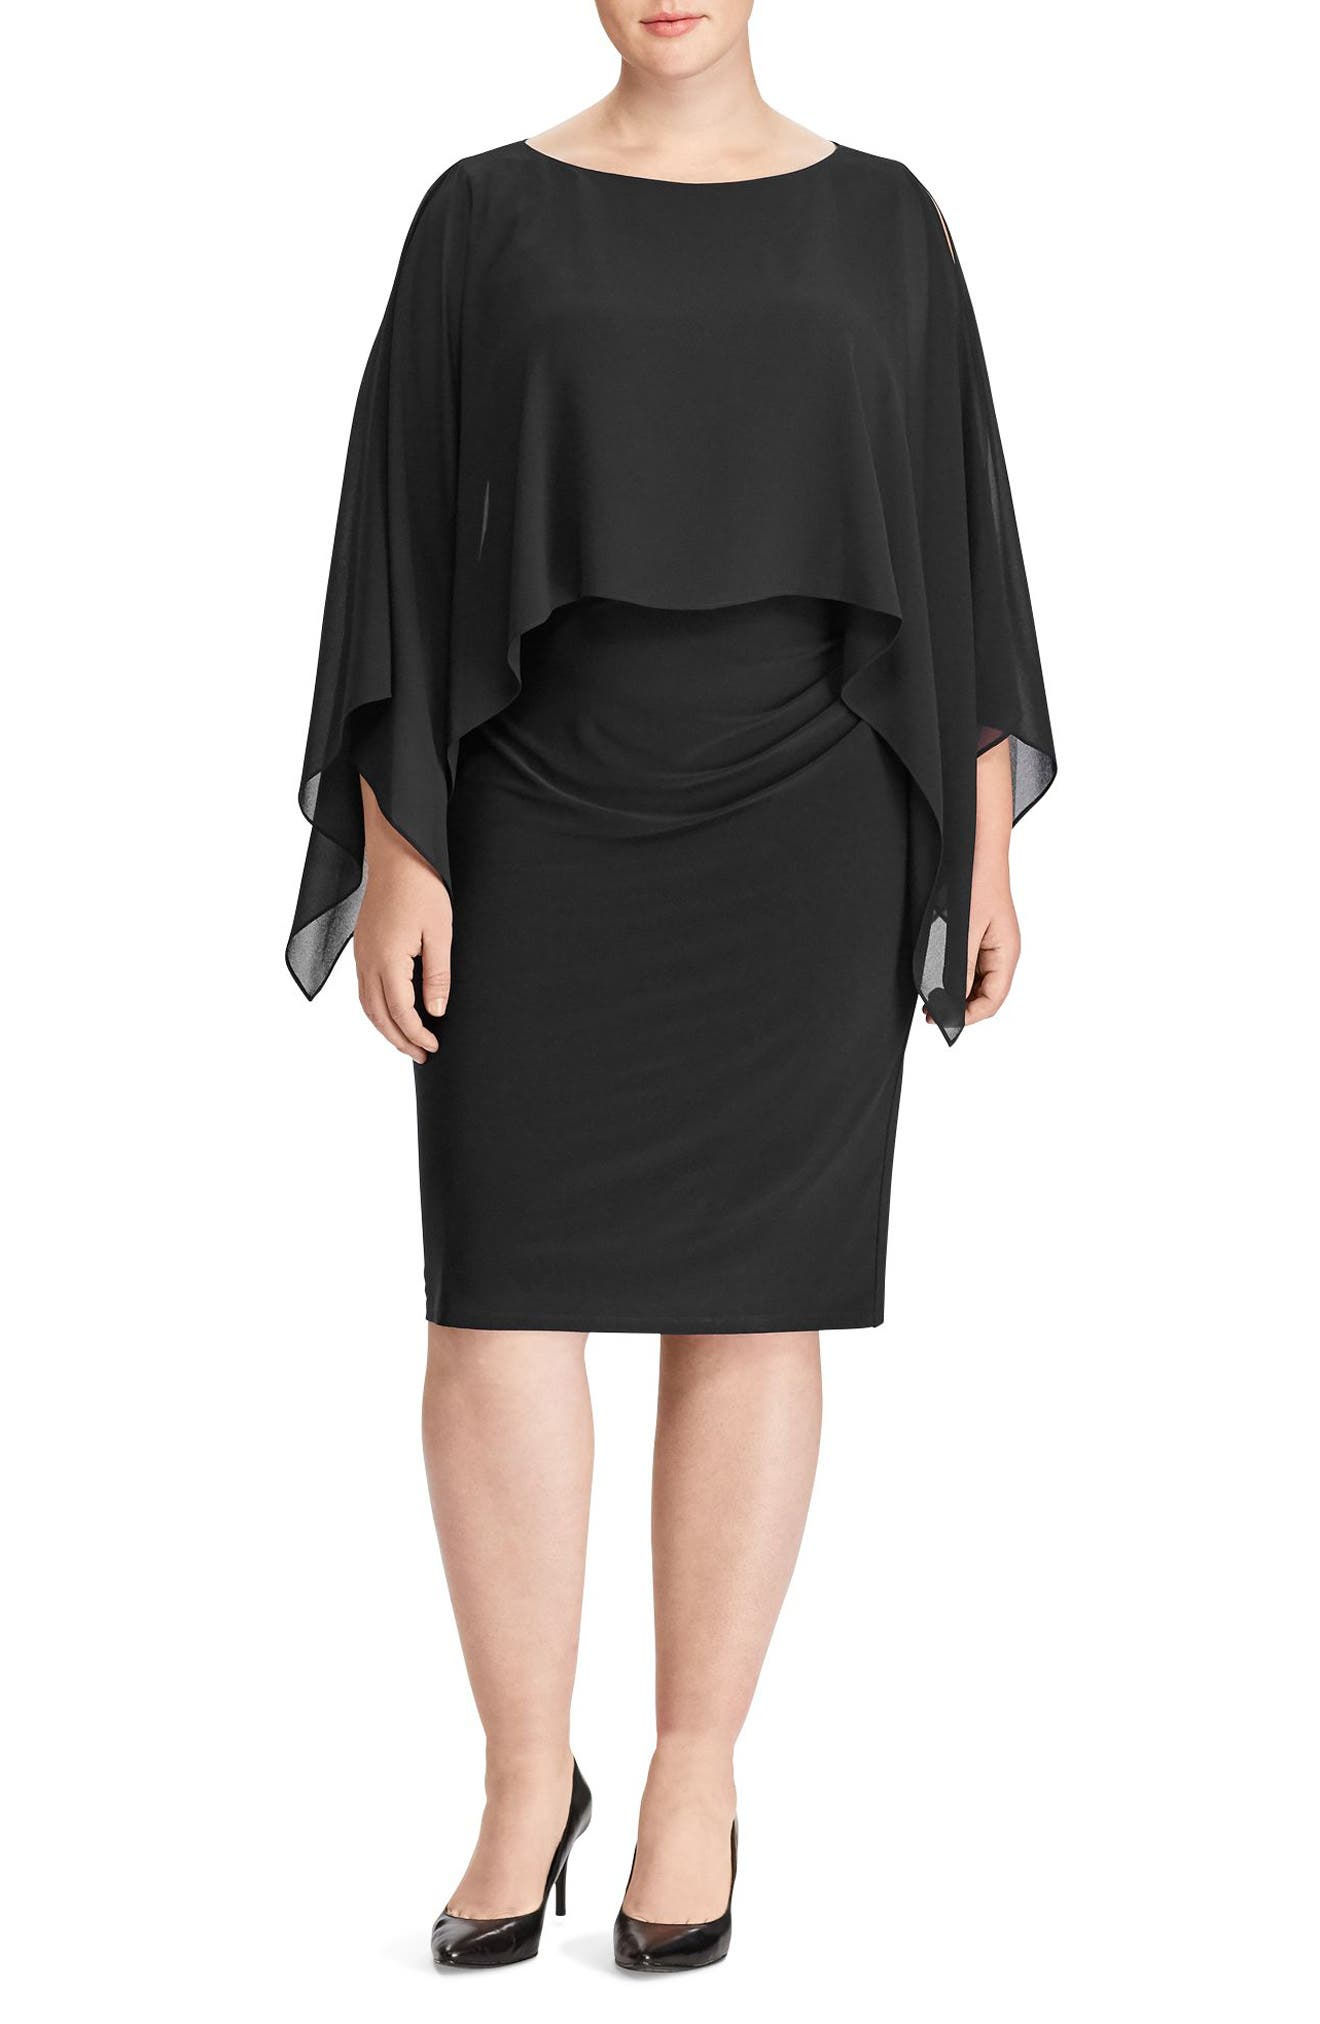 Mercinitta Dress,                             Main thumbnail 1, color,                             001